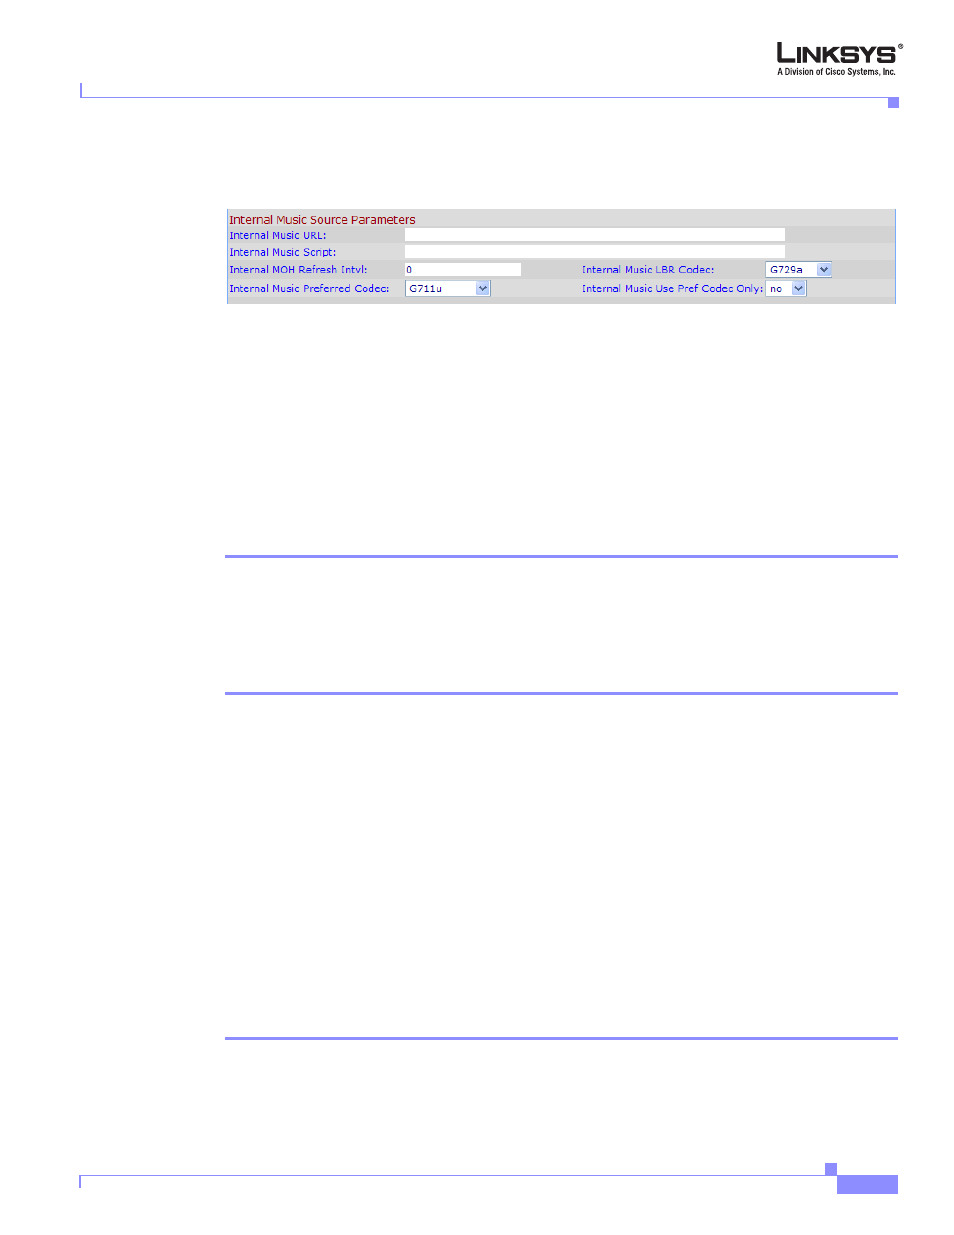 Restoring the default internal music source, Figure 4-14